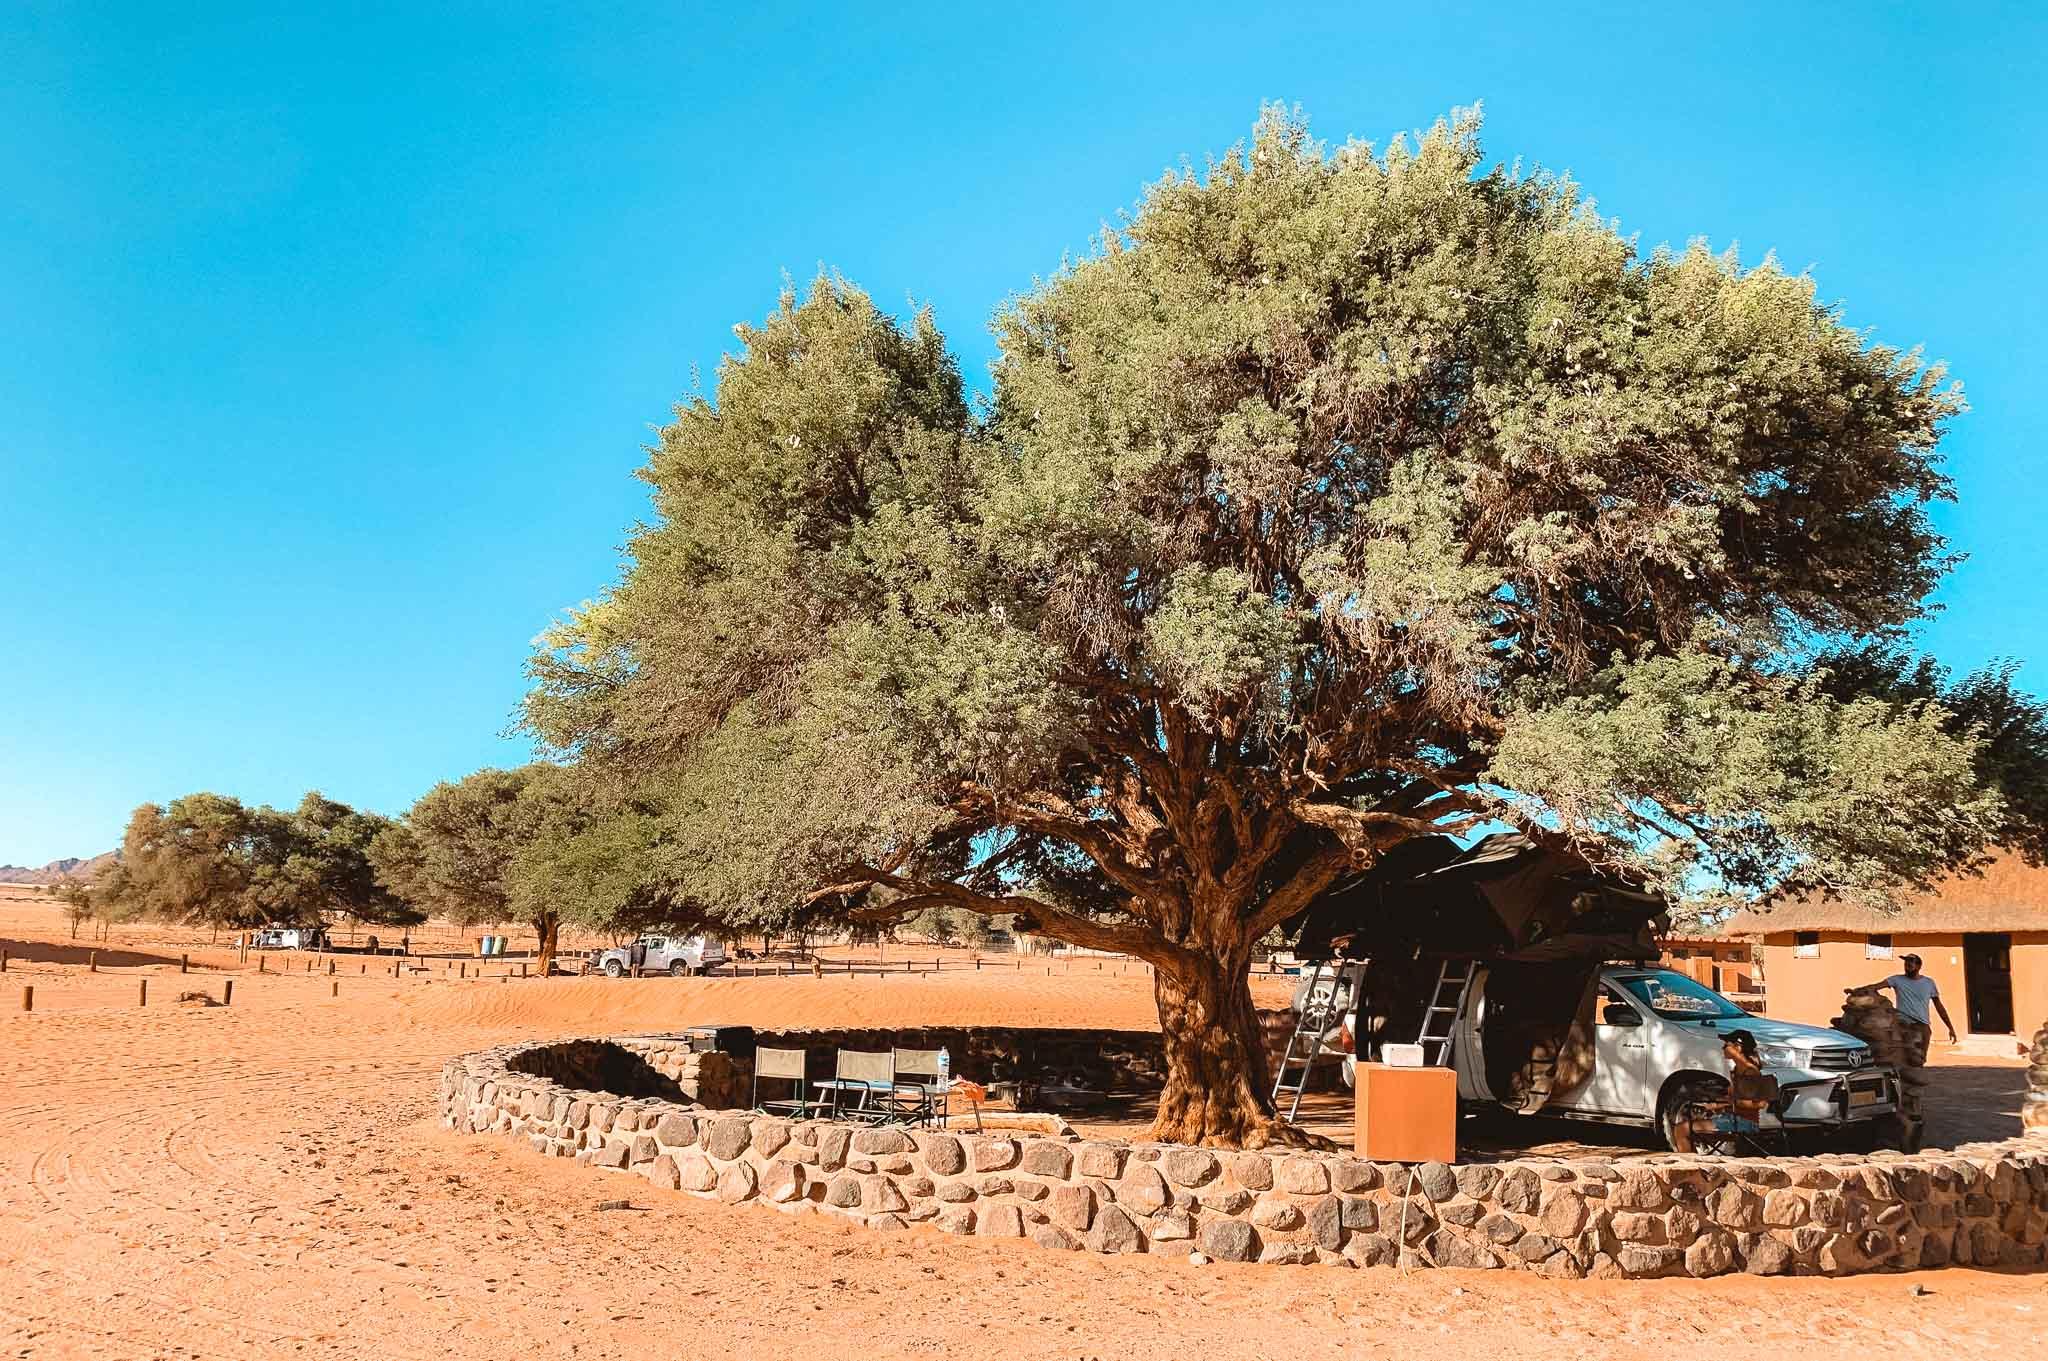 camping-sesriem-namibie